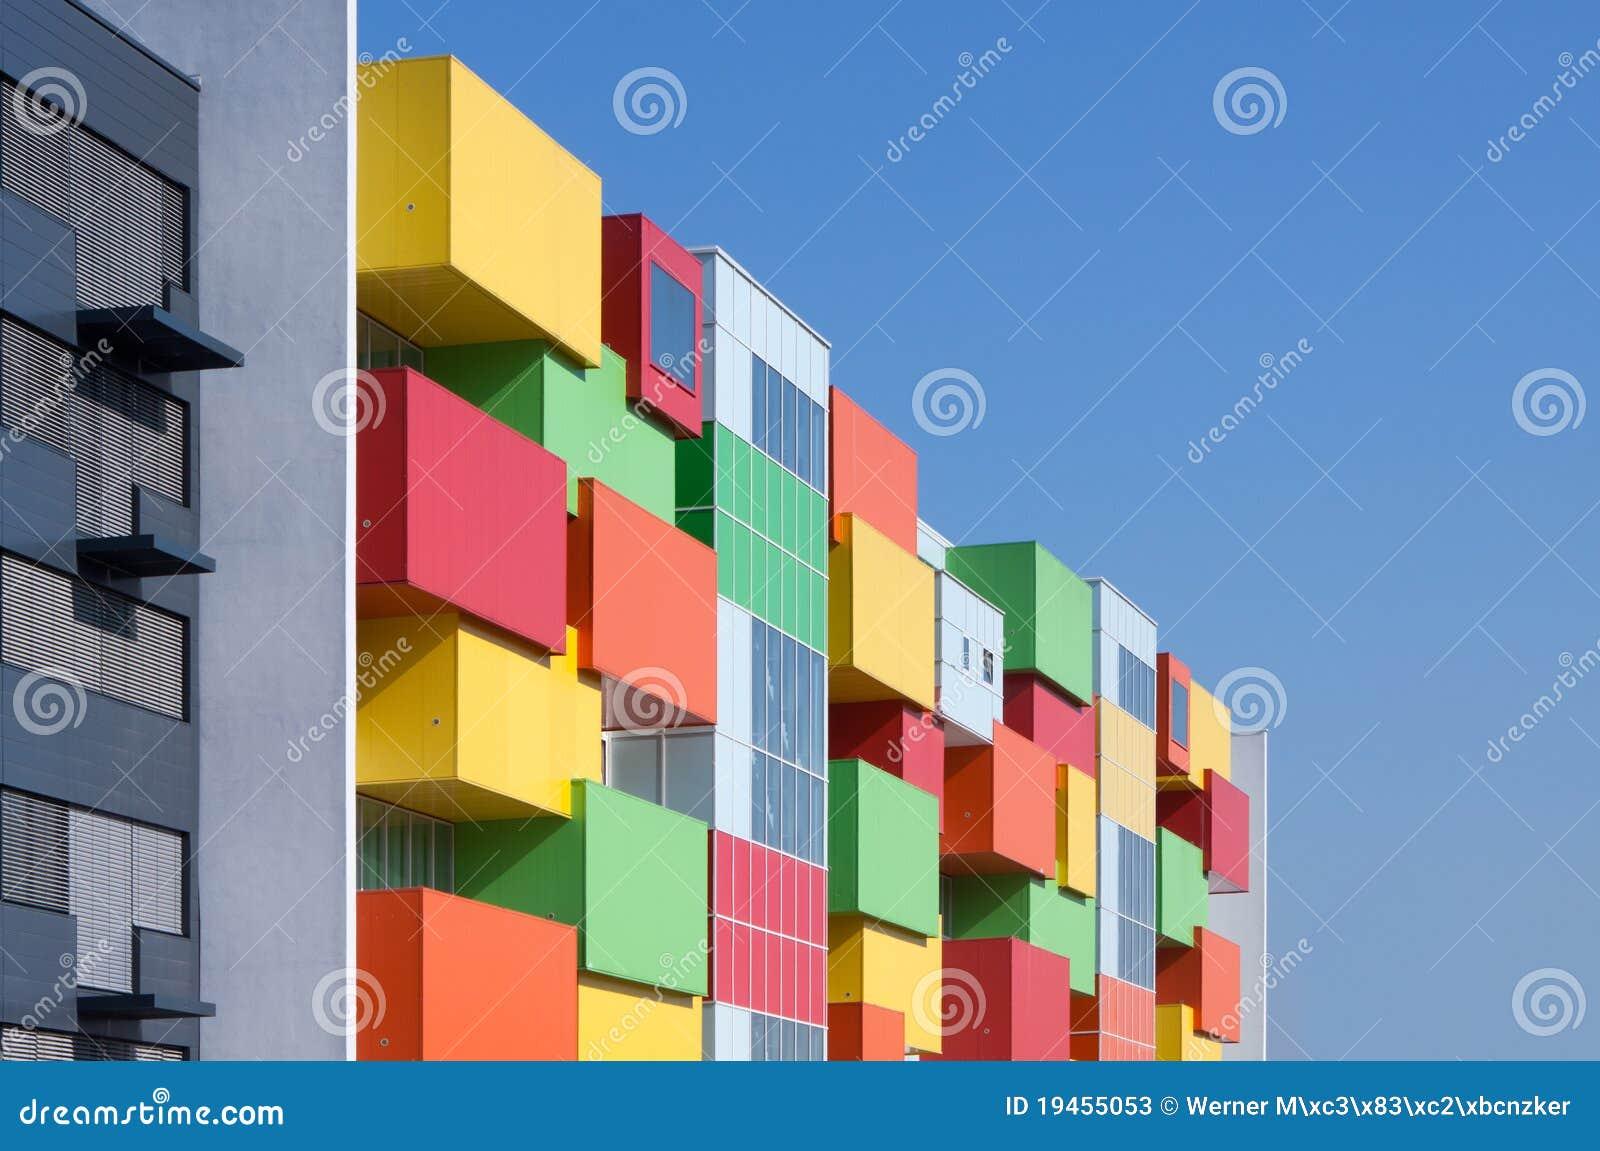 Colorful facade stock photos image 19455053 for Casas para jardin infantil